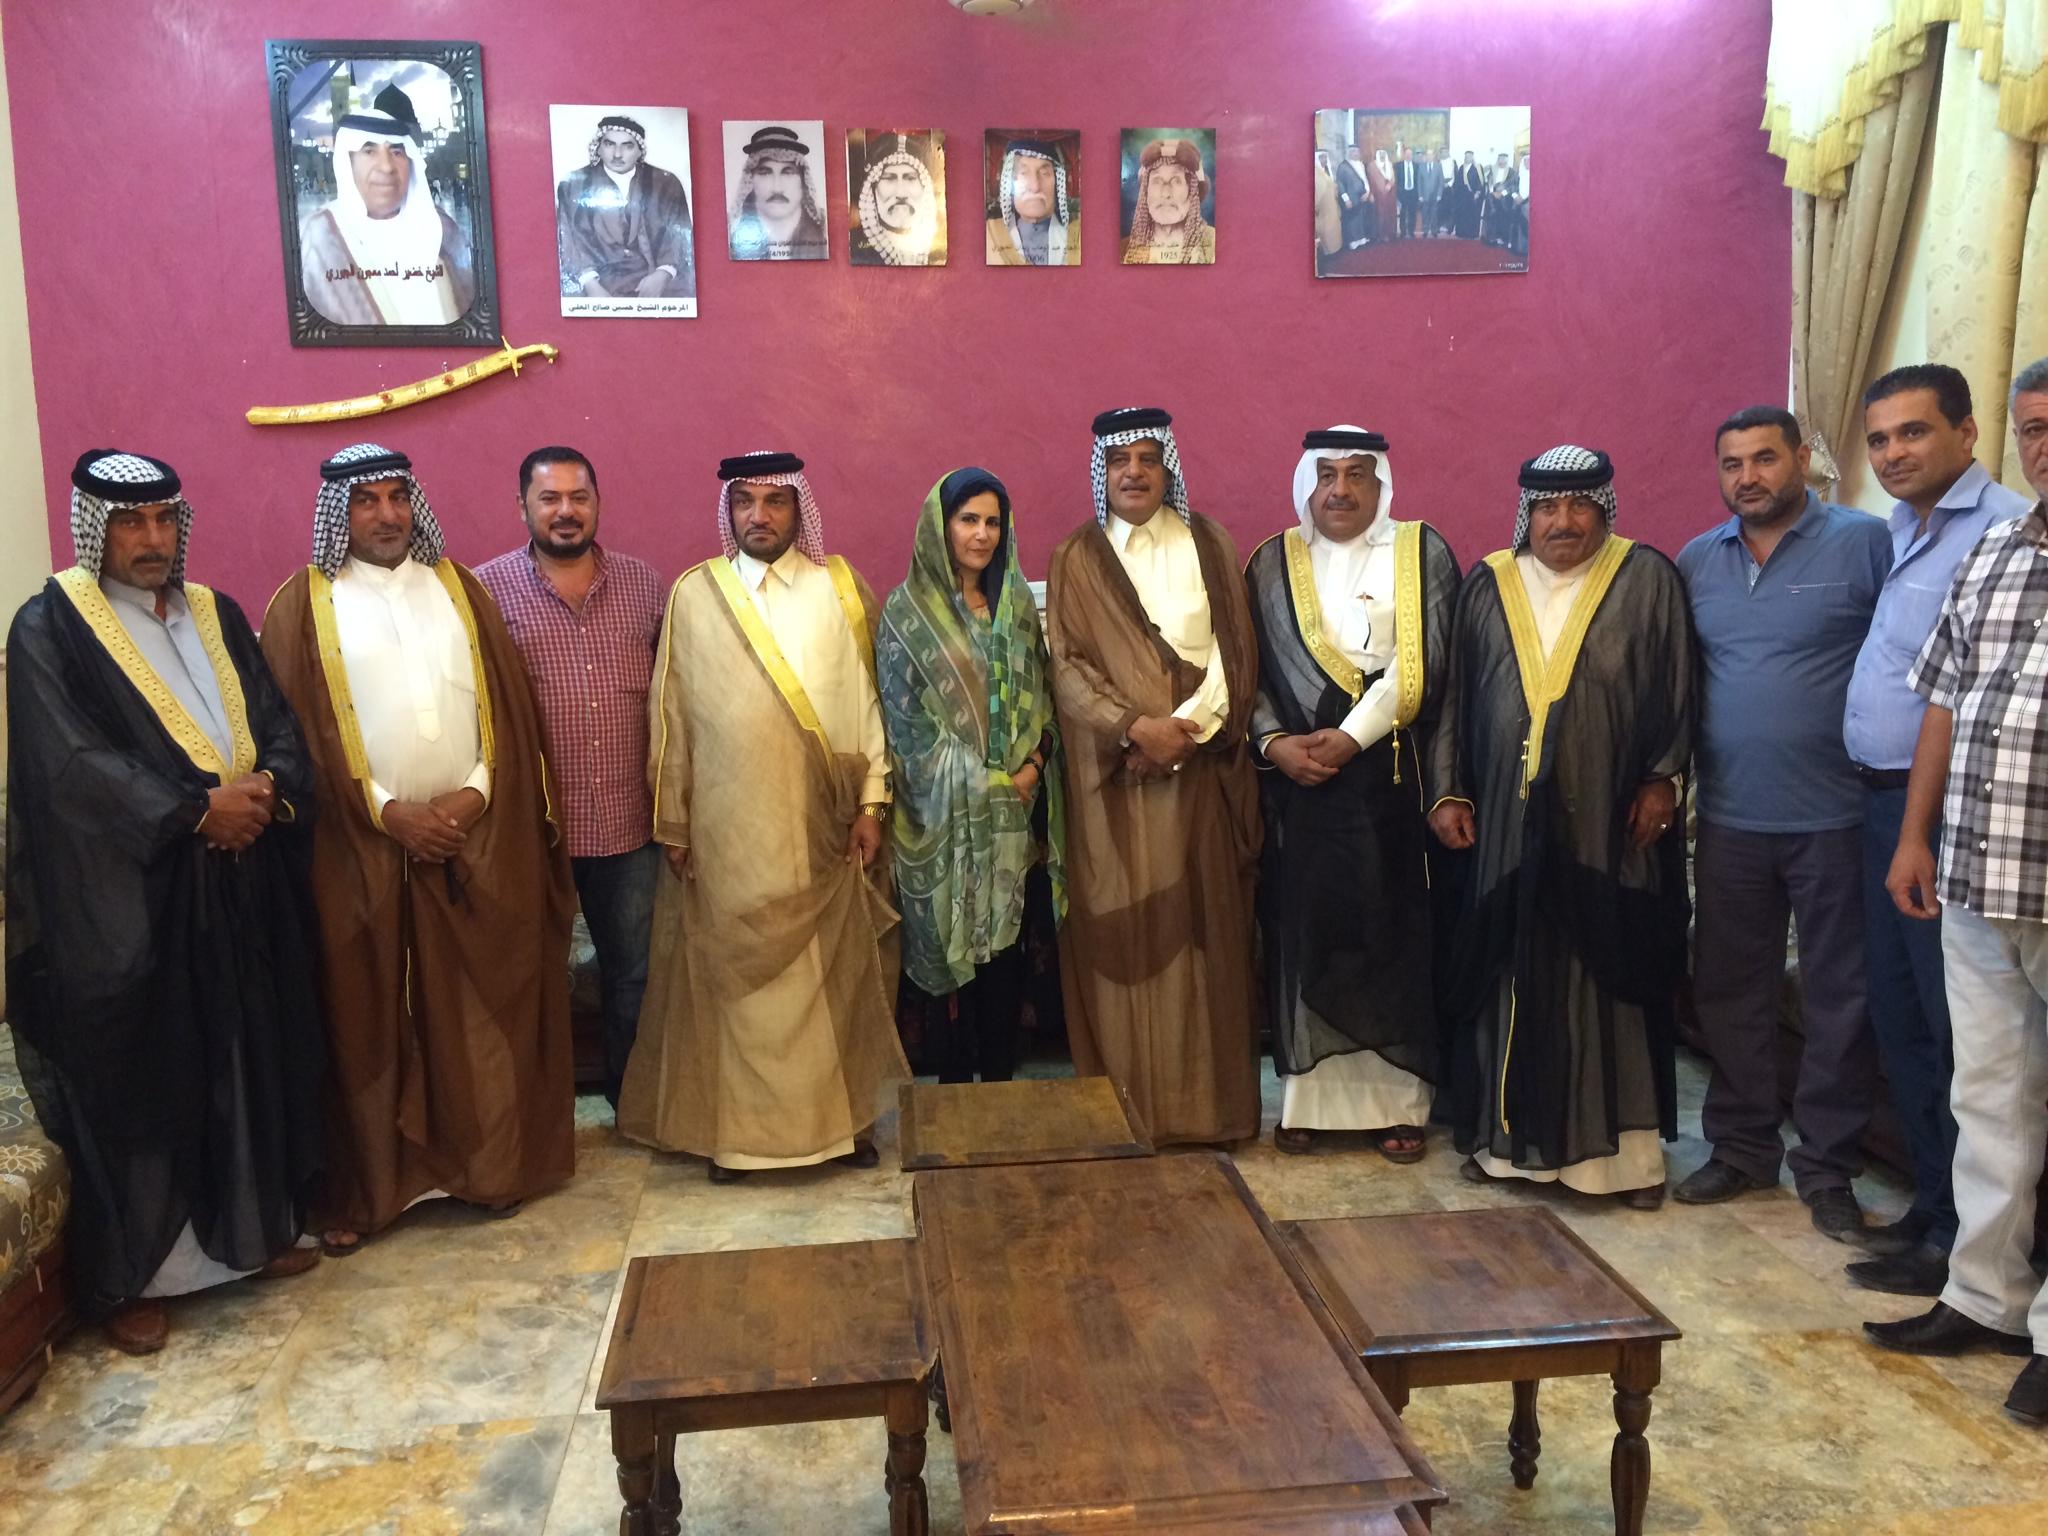 AHRA Director Amal Al-Jubouri with Iraqi Shekhs